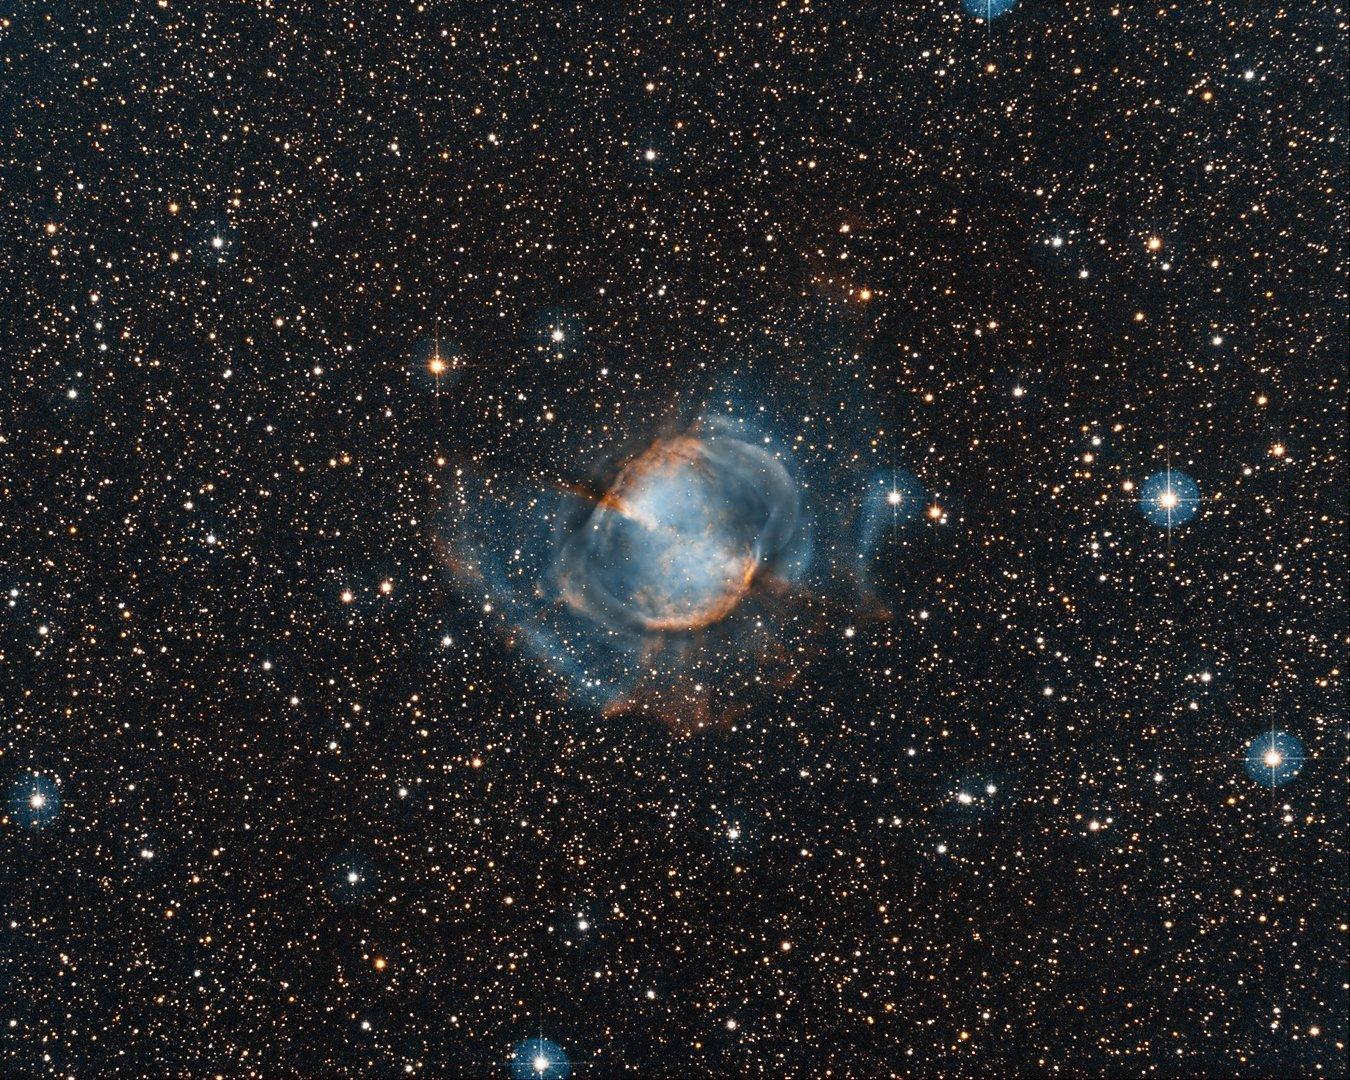 stellar and galactic astronomy uga - HD5498×4398